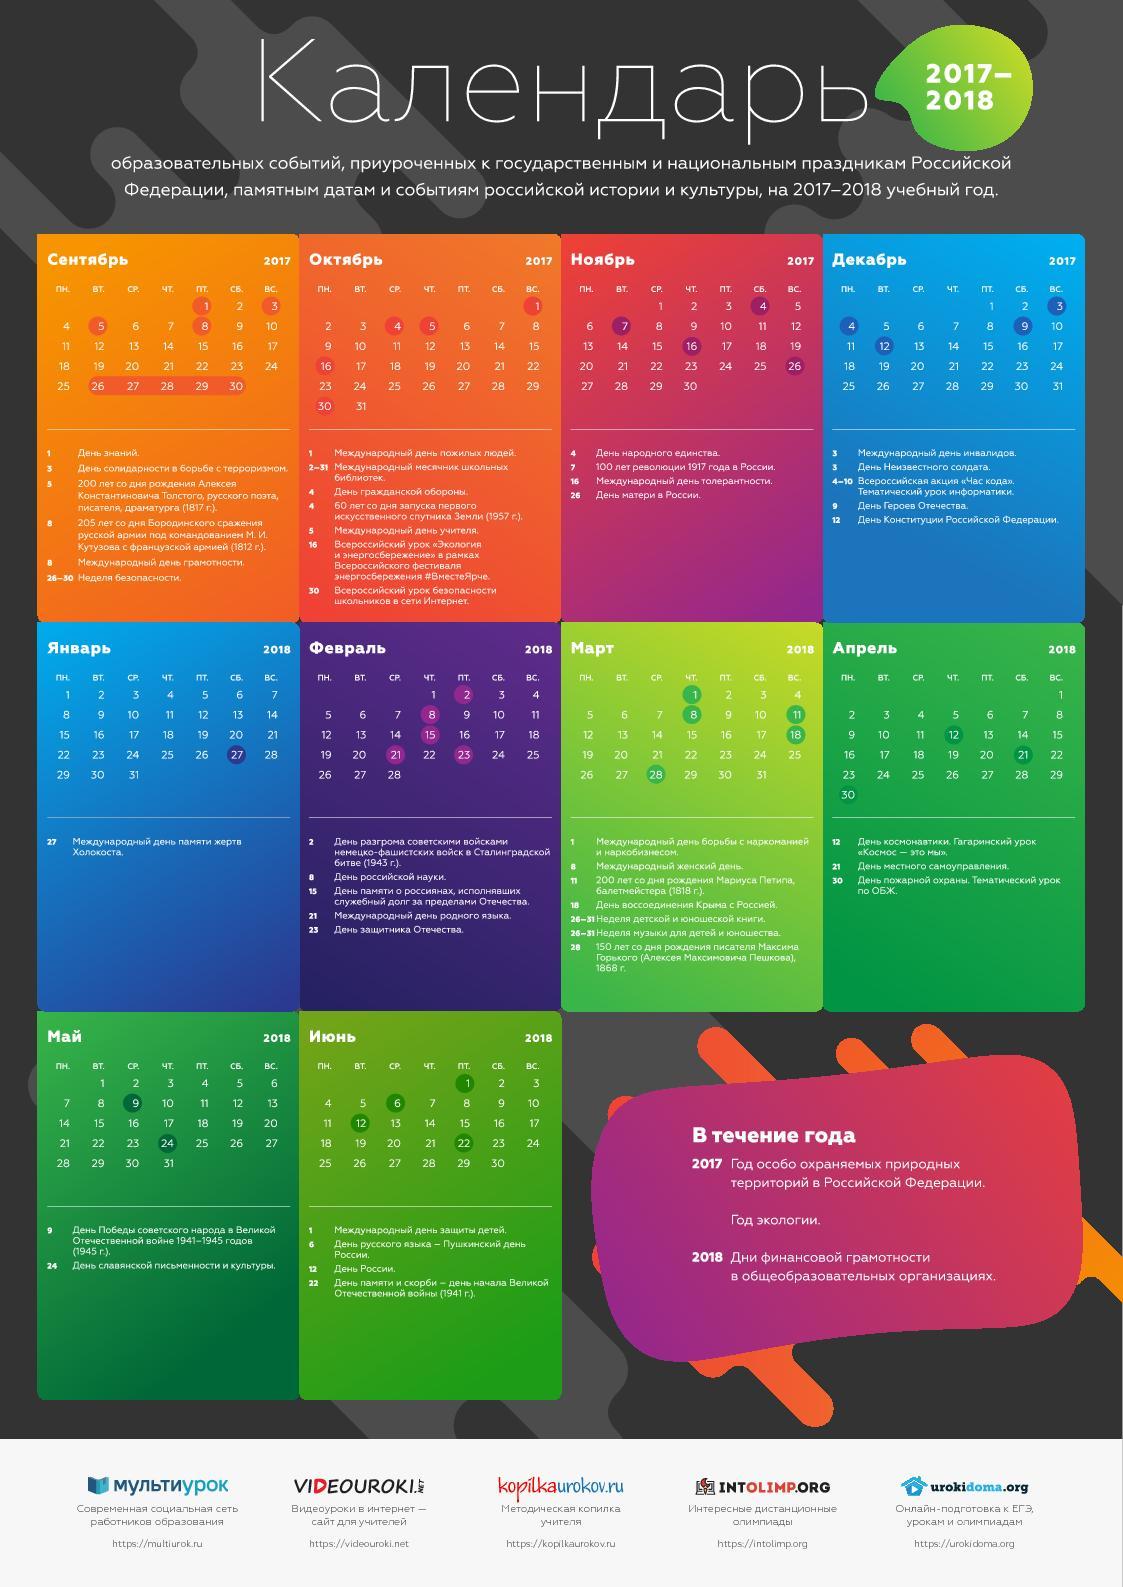 Календарь из смешариков динопарке